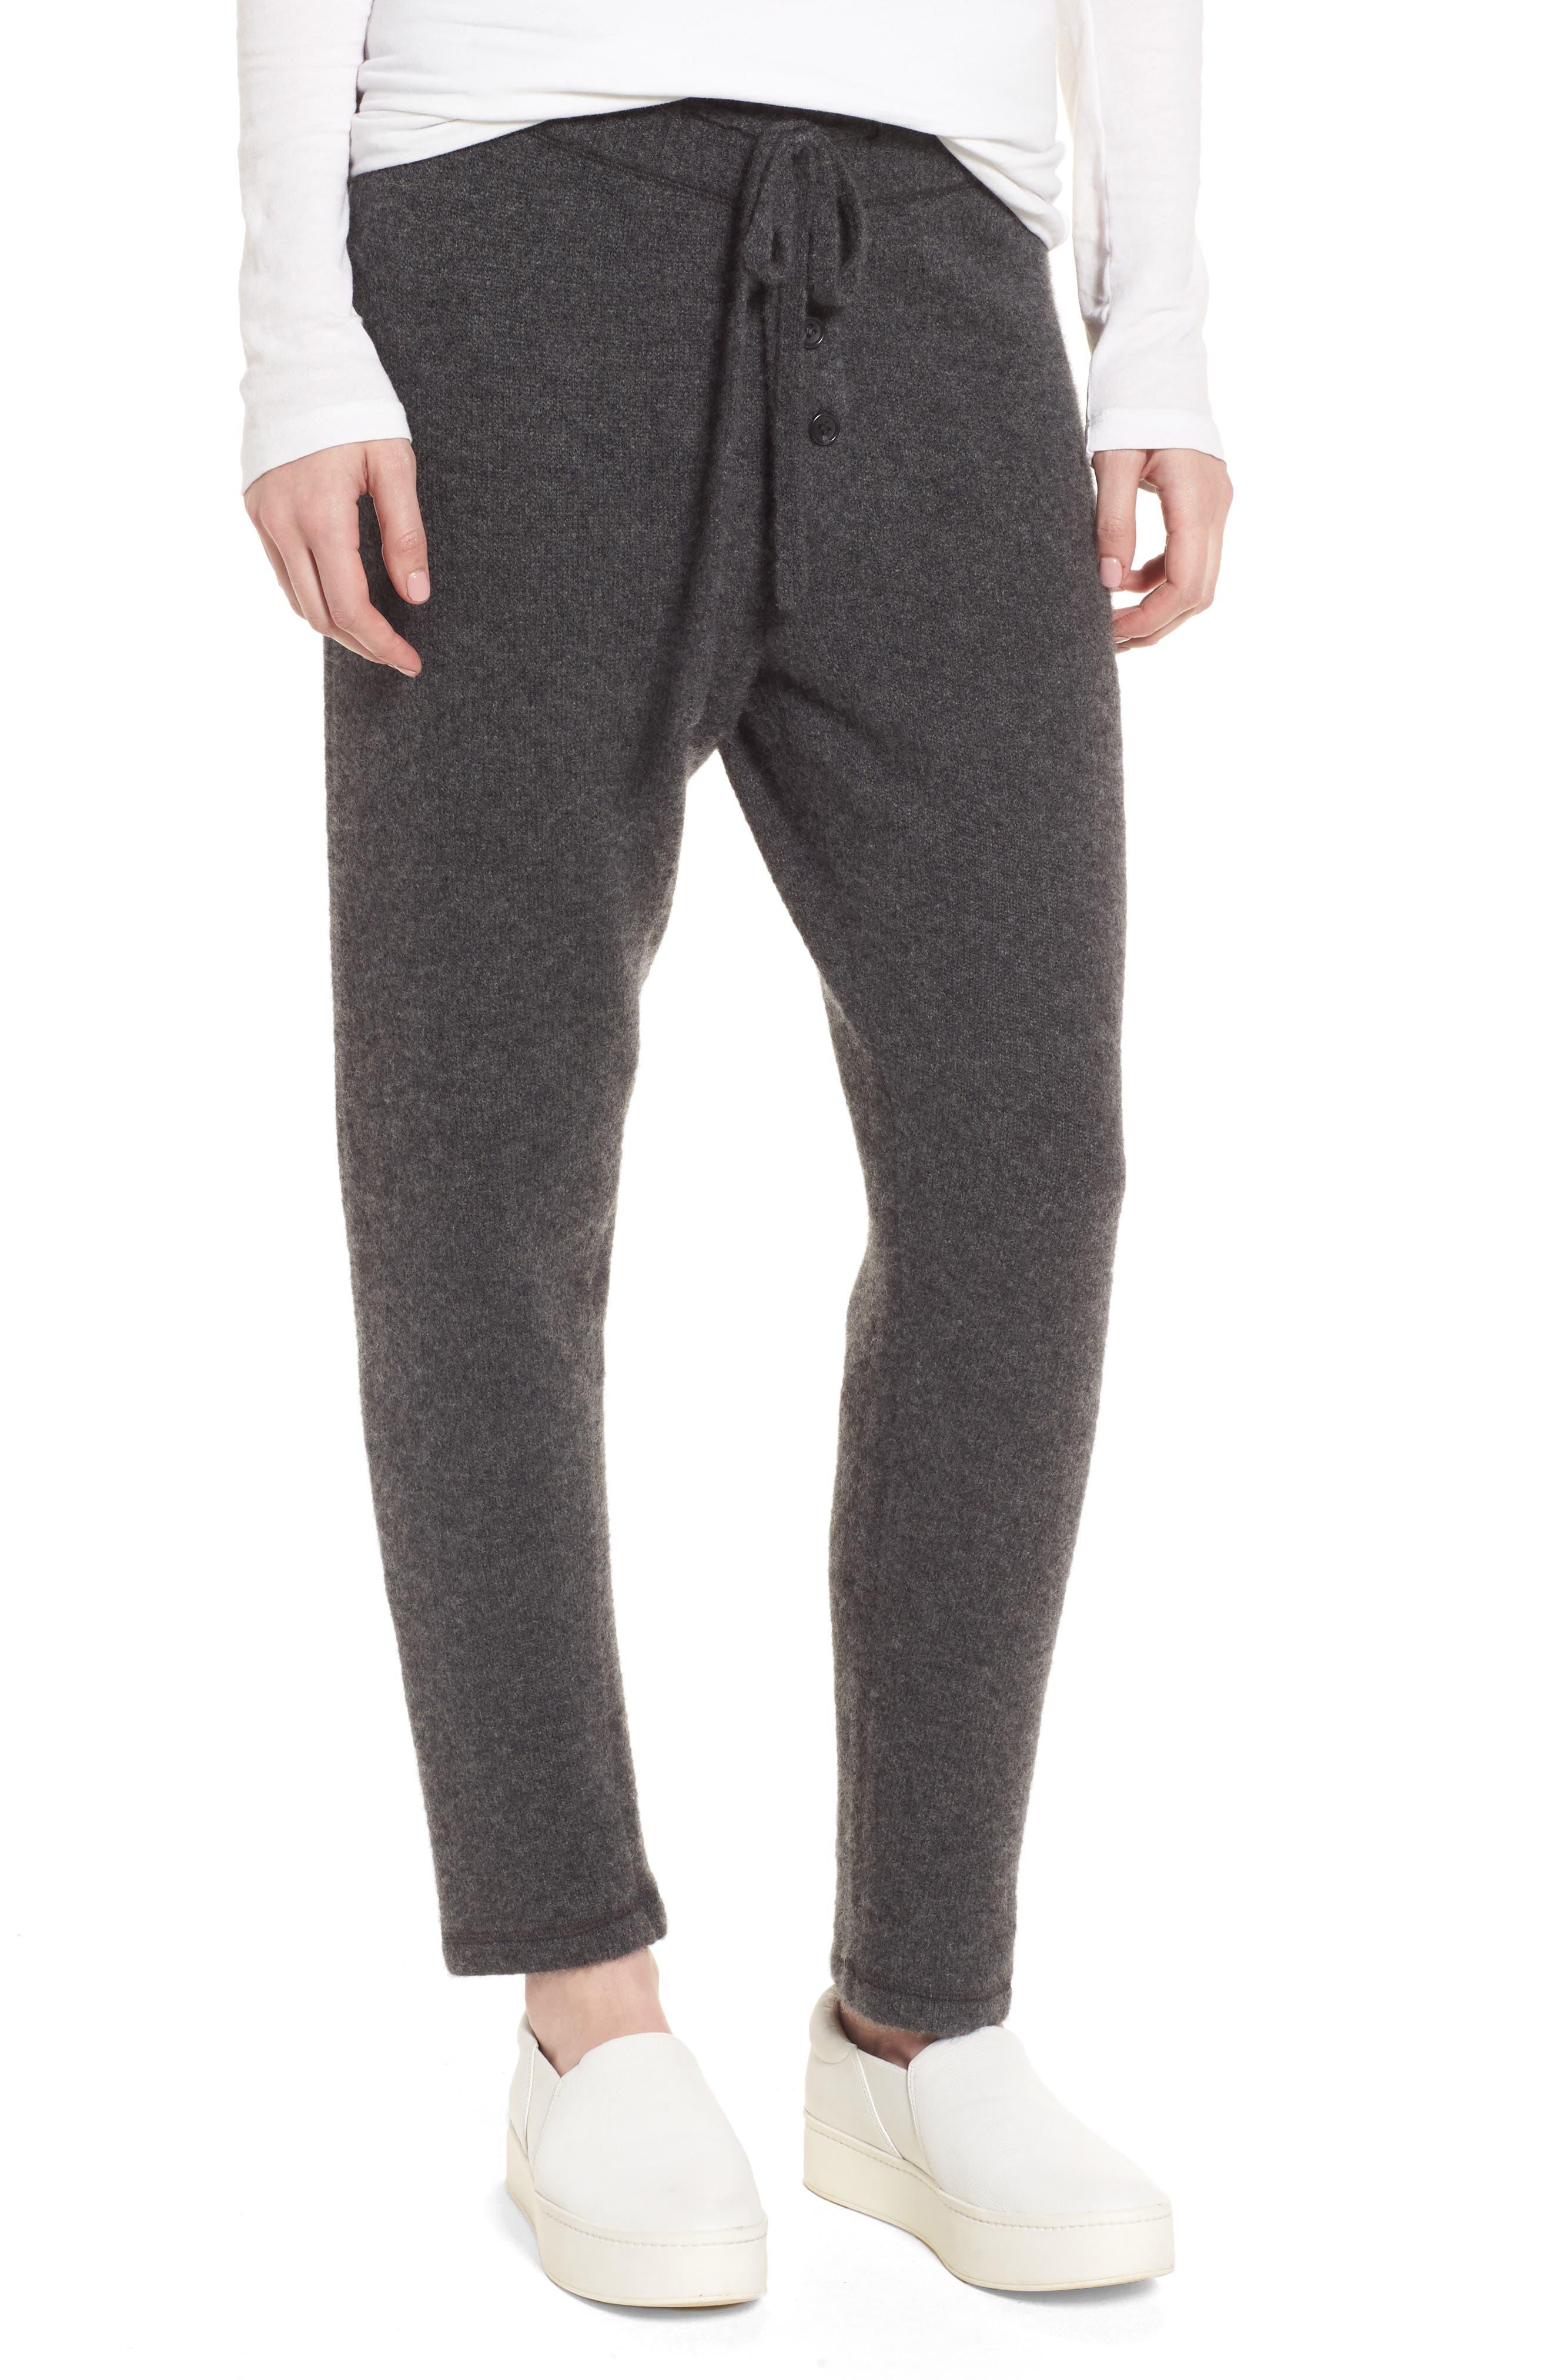 Brushed Cashmere Sweatpants,                             Main thumbnail 1, color,                             Charcoal